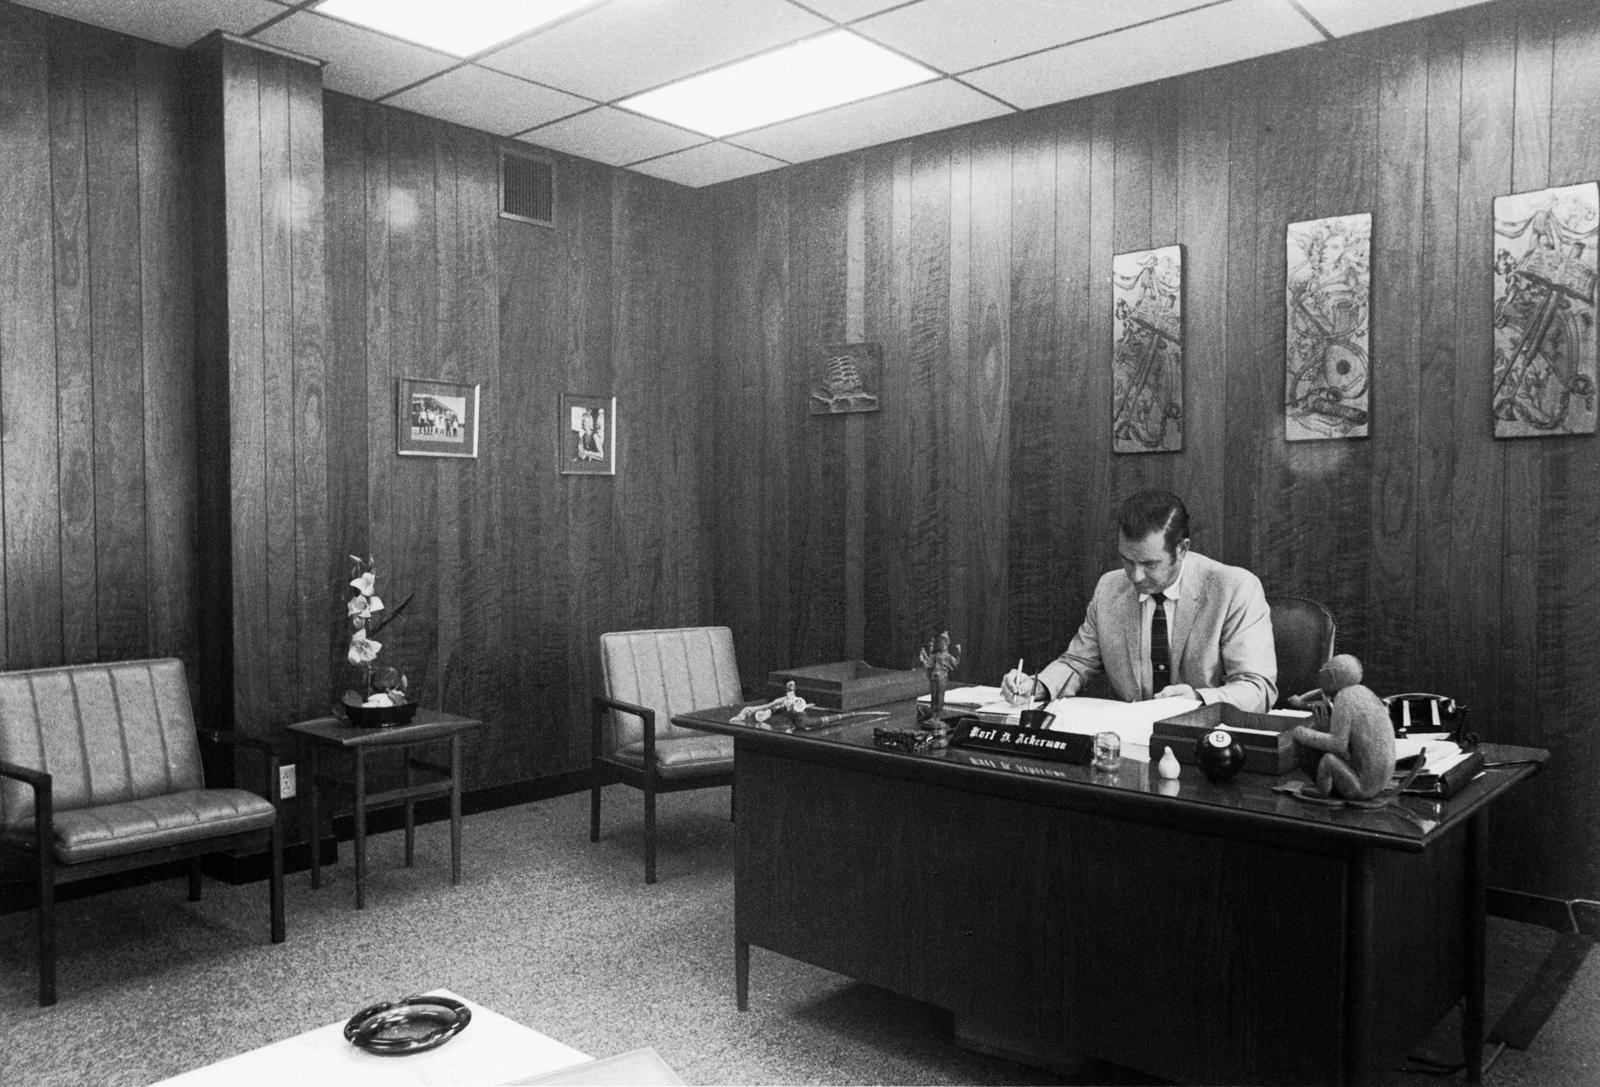 Bangkok - Chancery Office Building - 1969